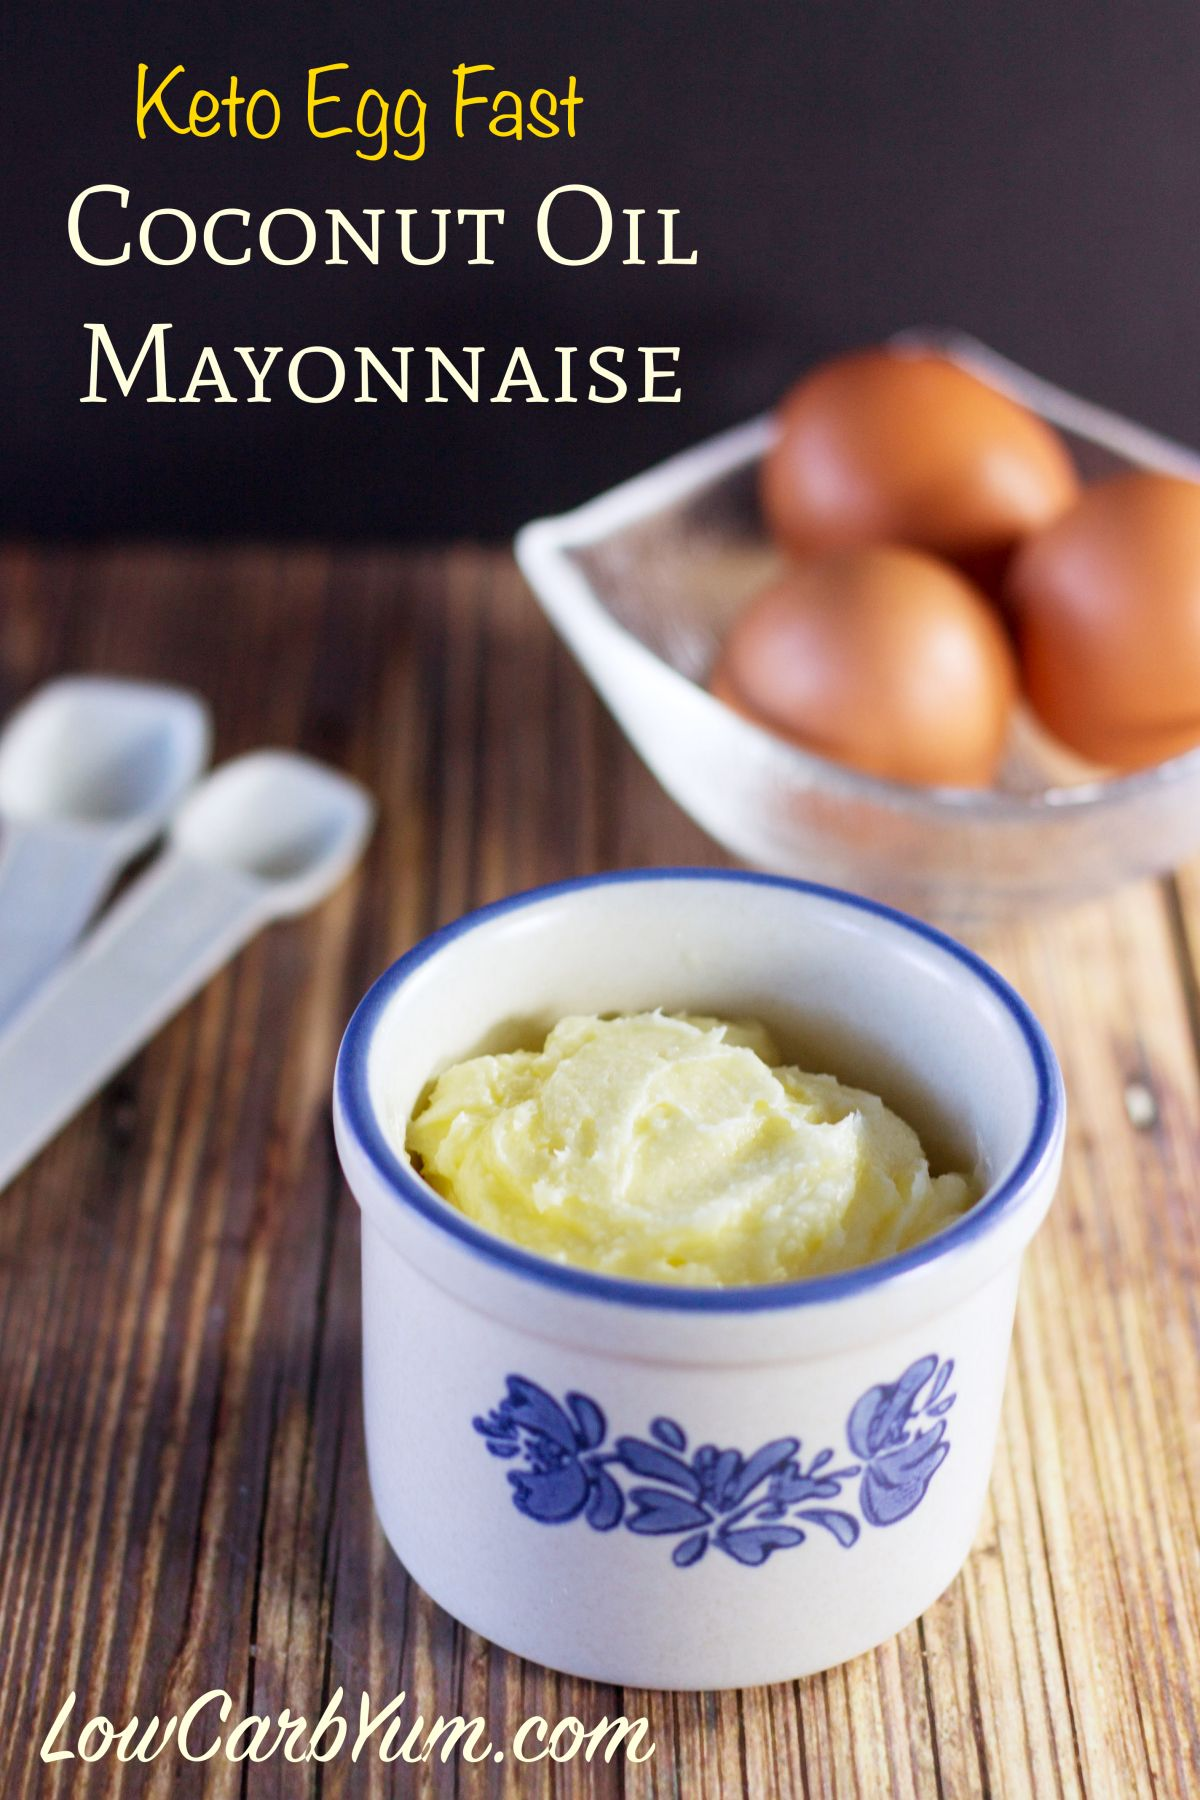 Die Mayonnaise-Diät